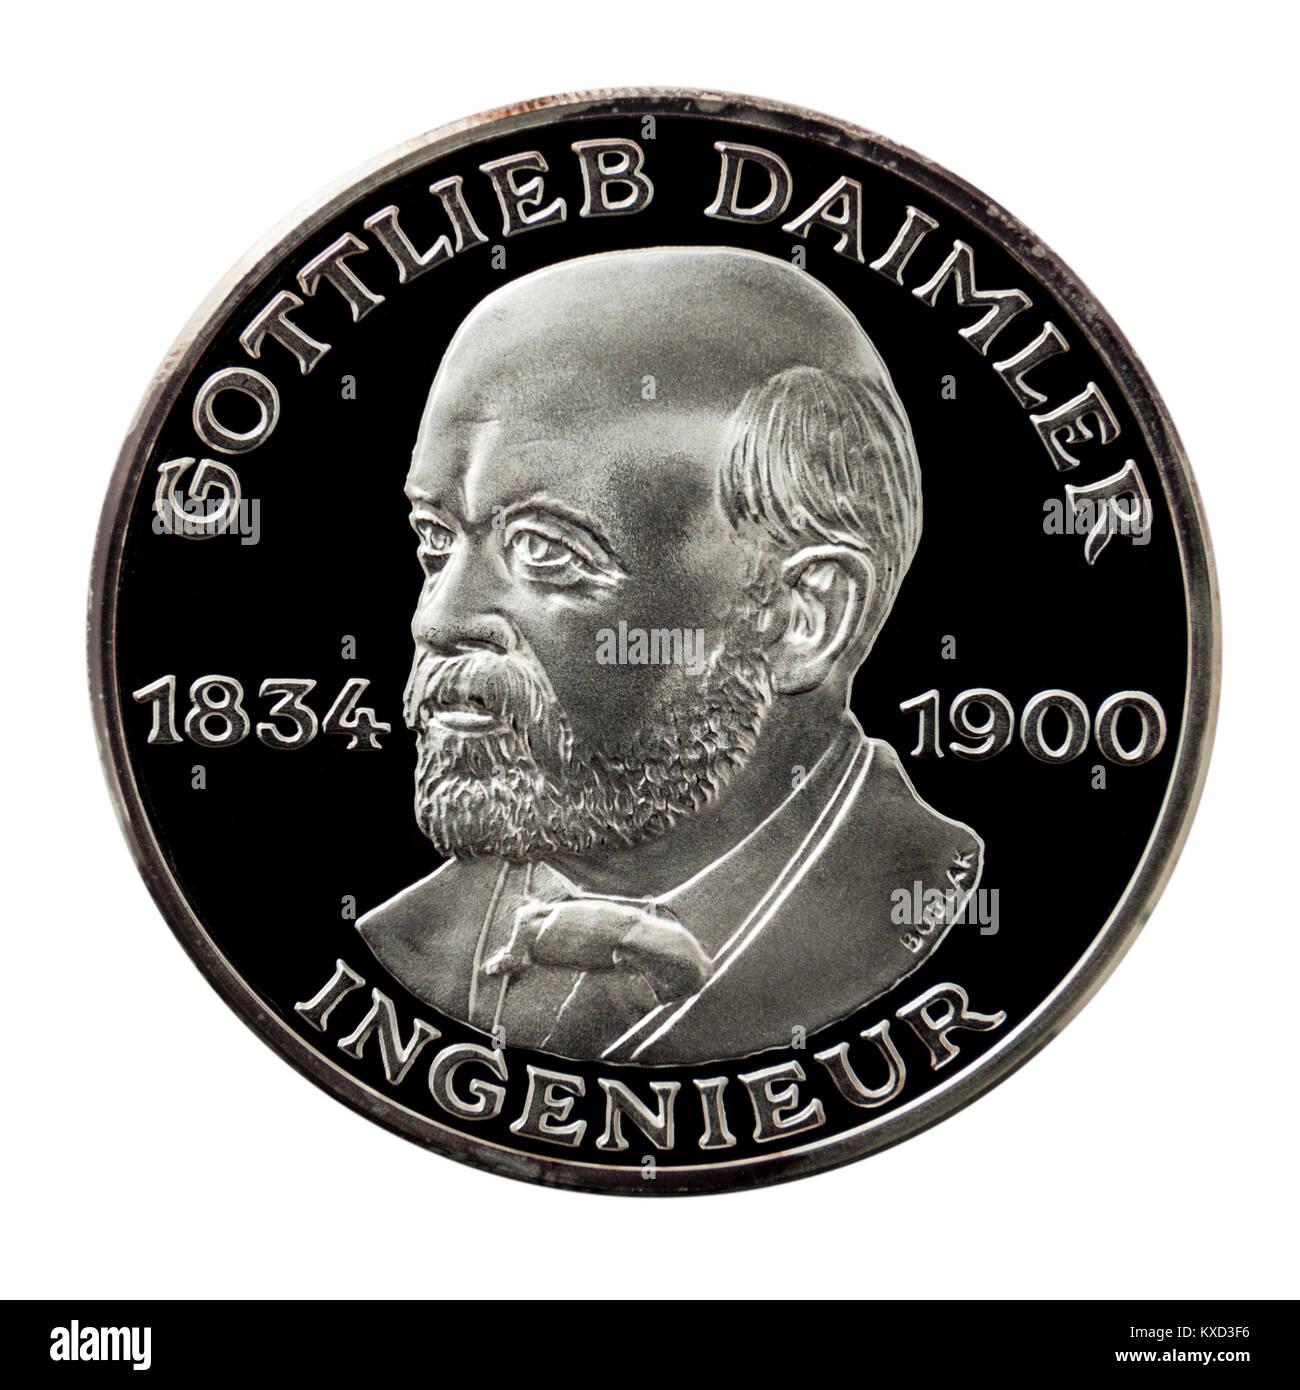 99.9% Proof Silver Medallion featuring Gottlieb Wilhelm Daimler (1834-1900), the founder of Daimler Motoren Gesellschaft - Stock Image